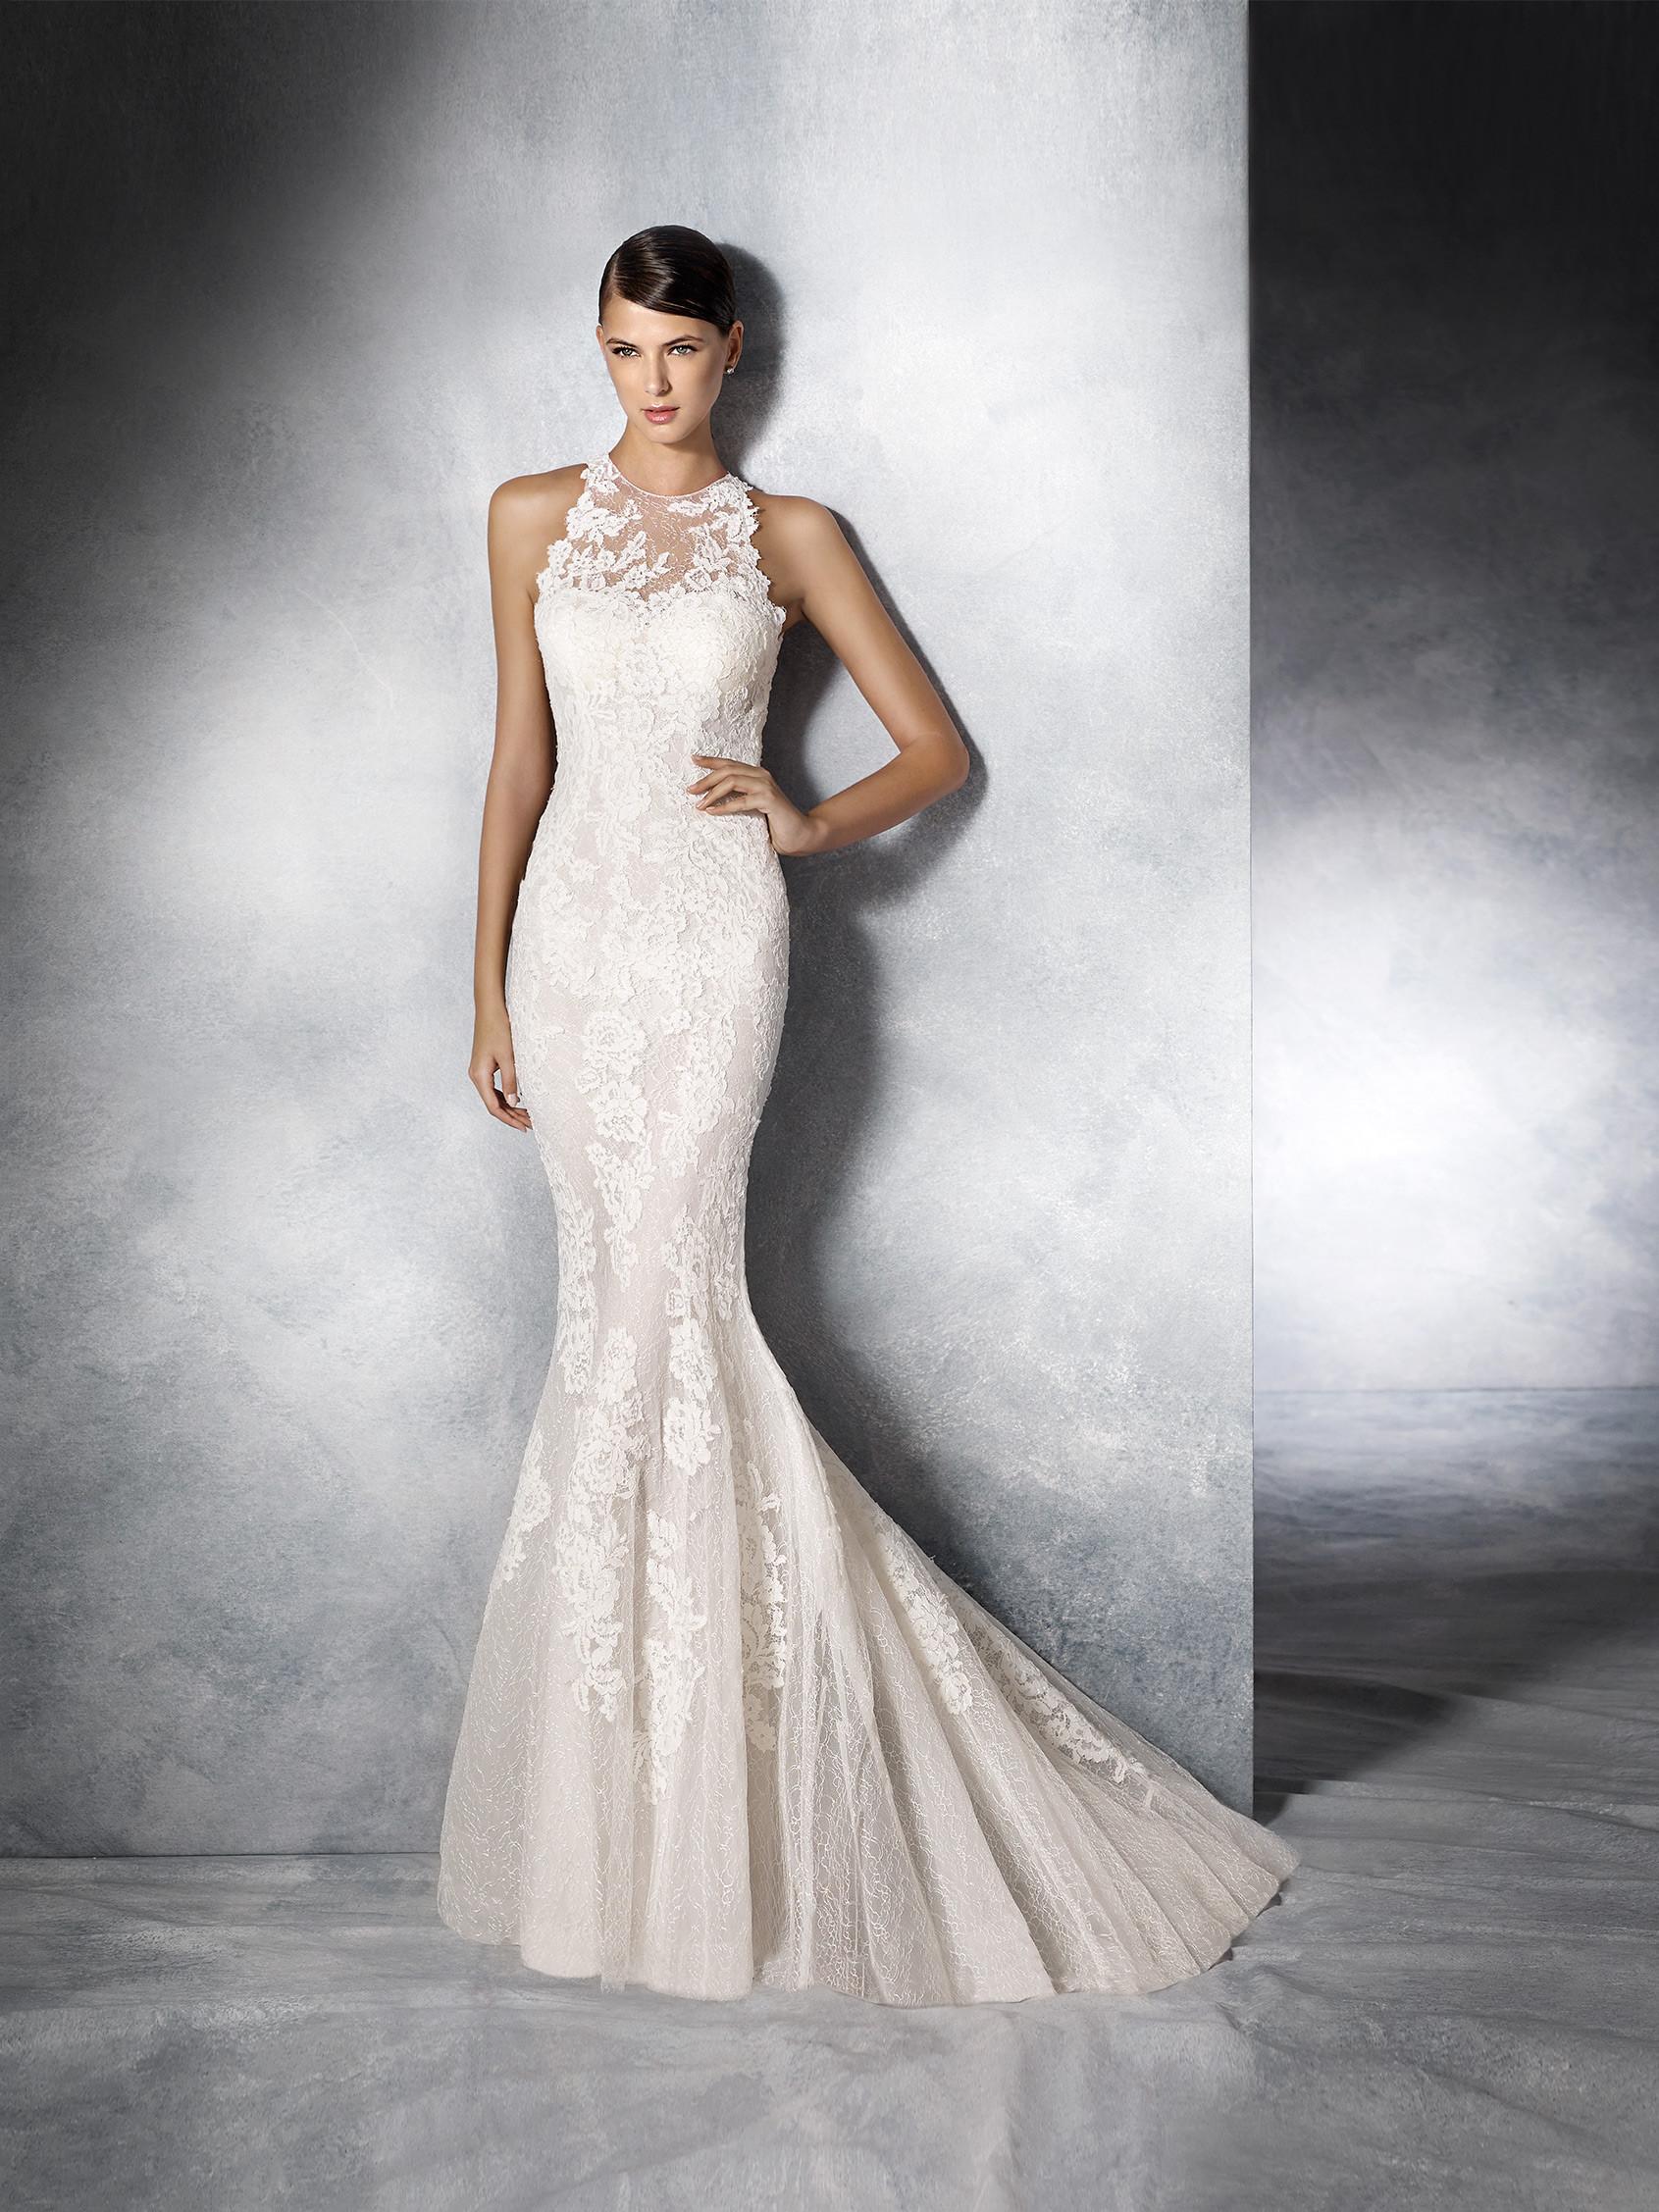 Amberg Hochzeitskleid Meerjungfrau